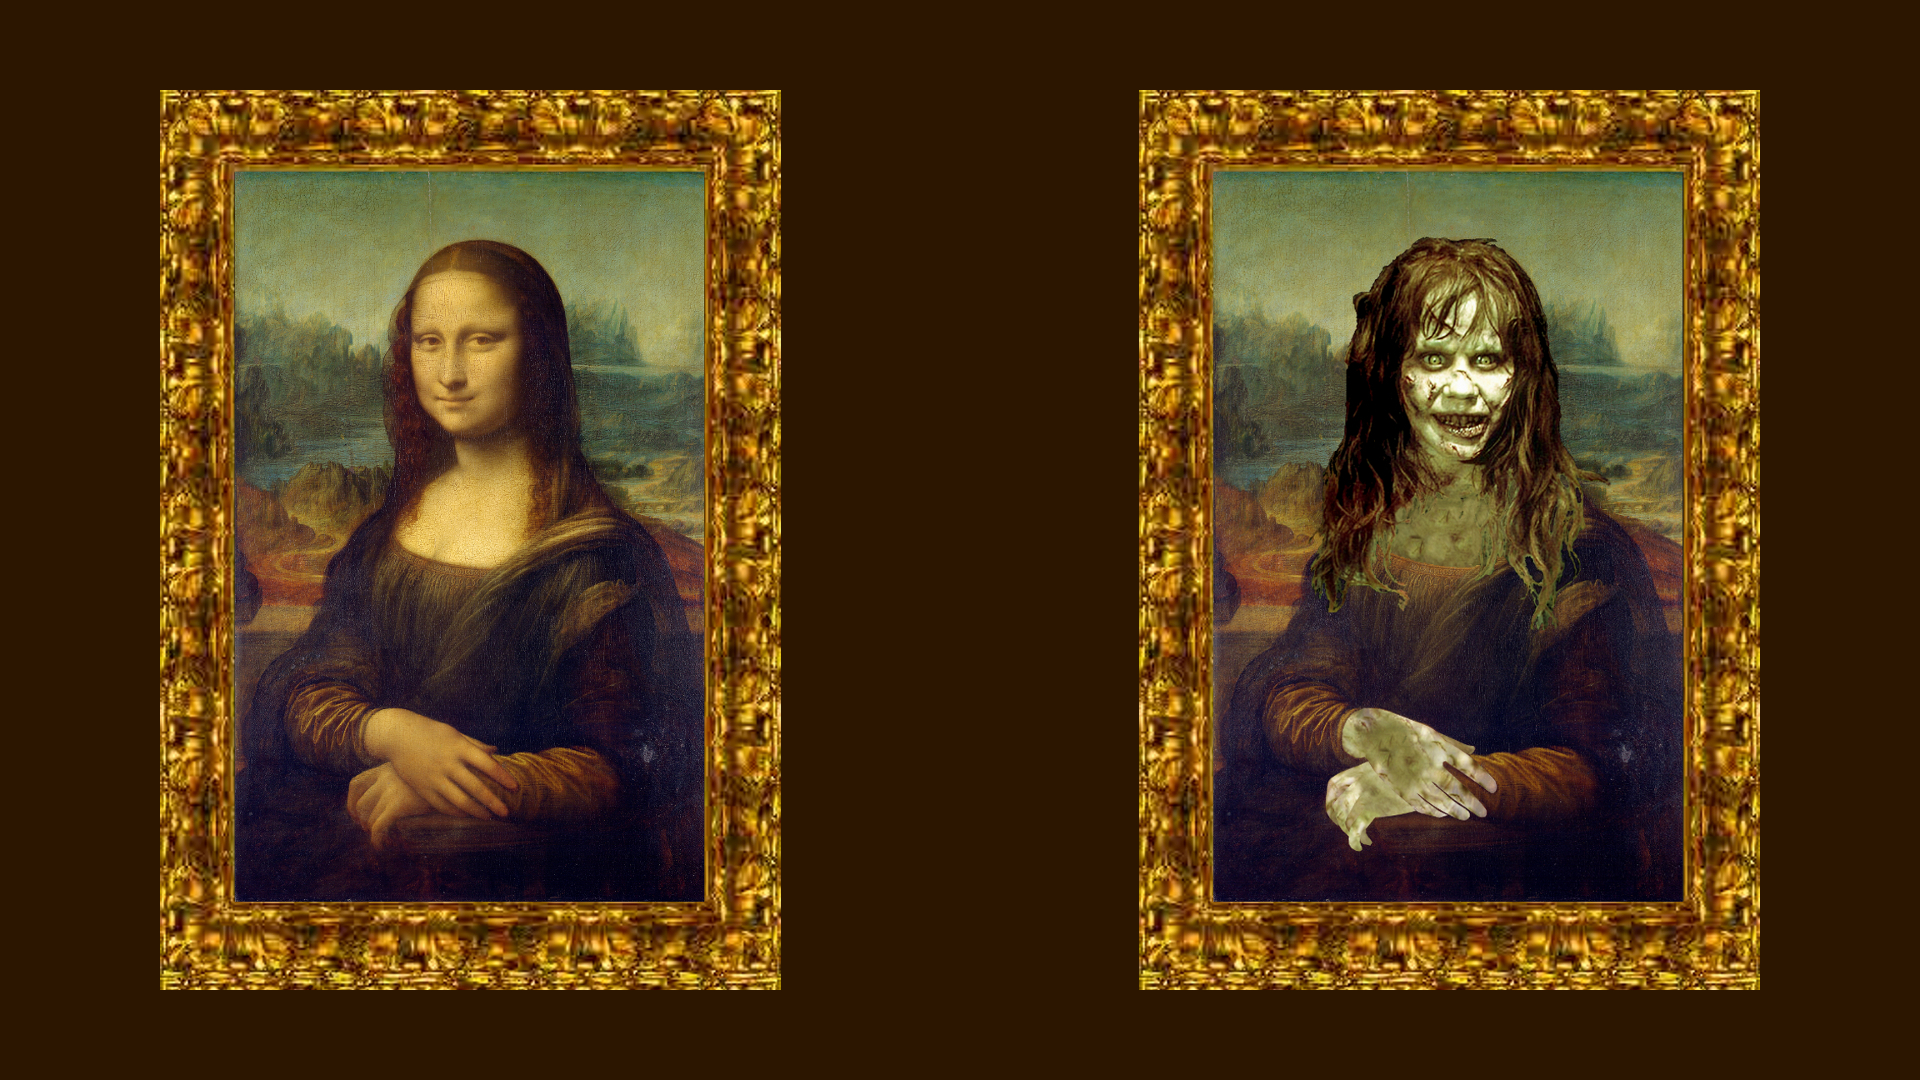 Free Download Mona Lisa Full Hd Leonardo Da Vinci Wallpaper